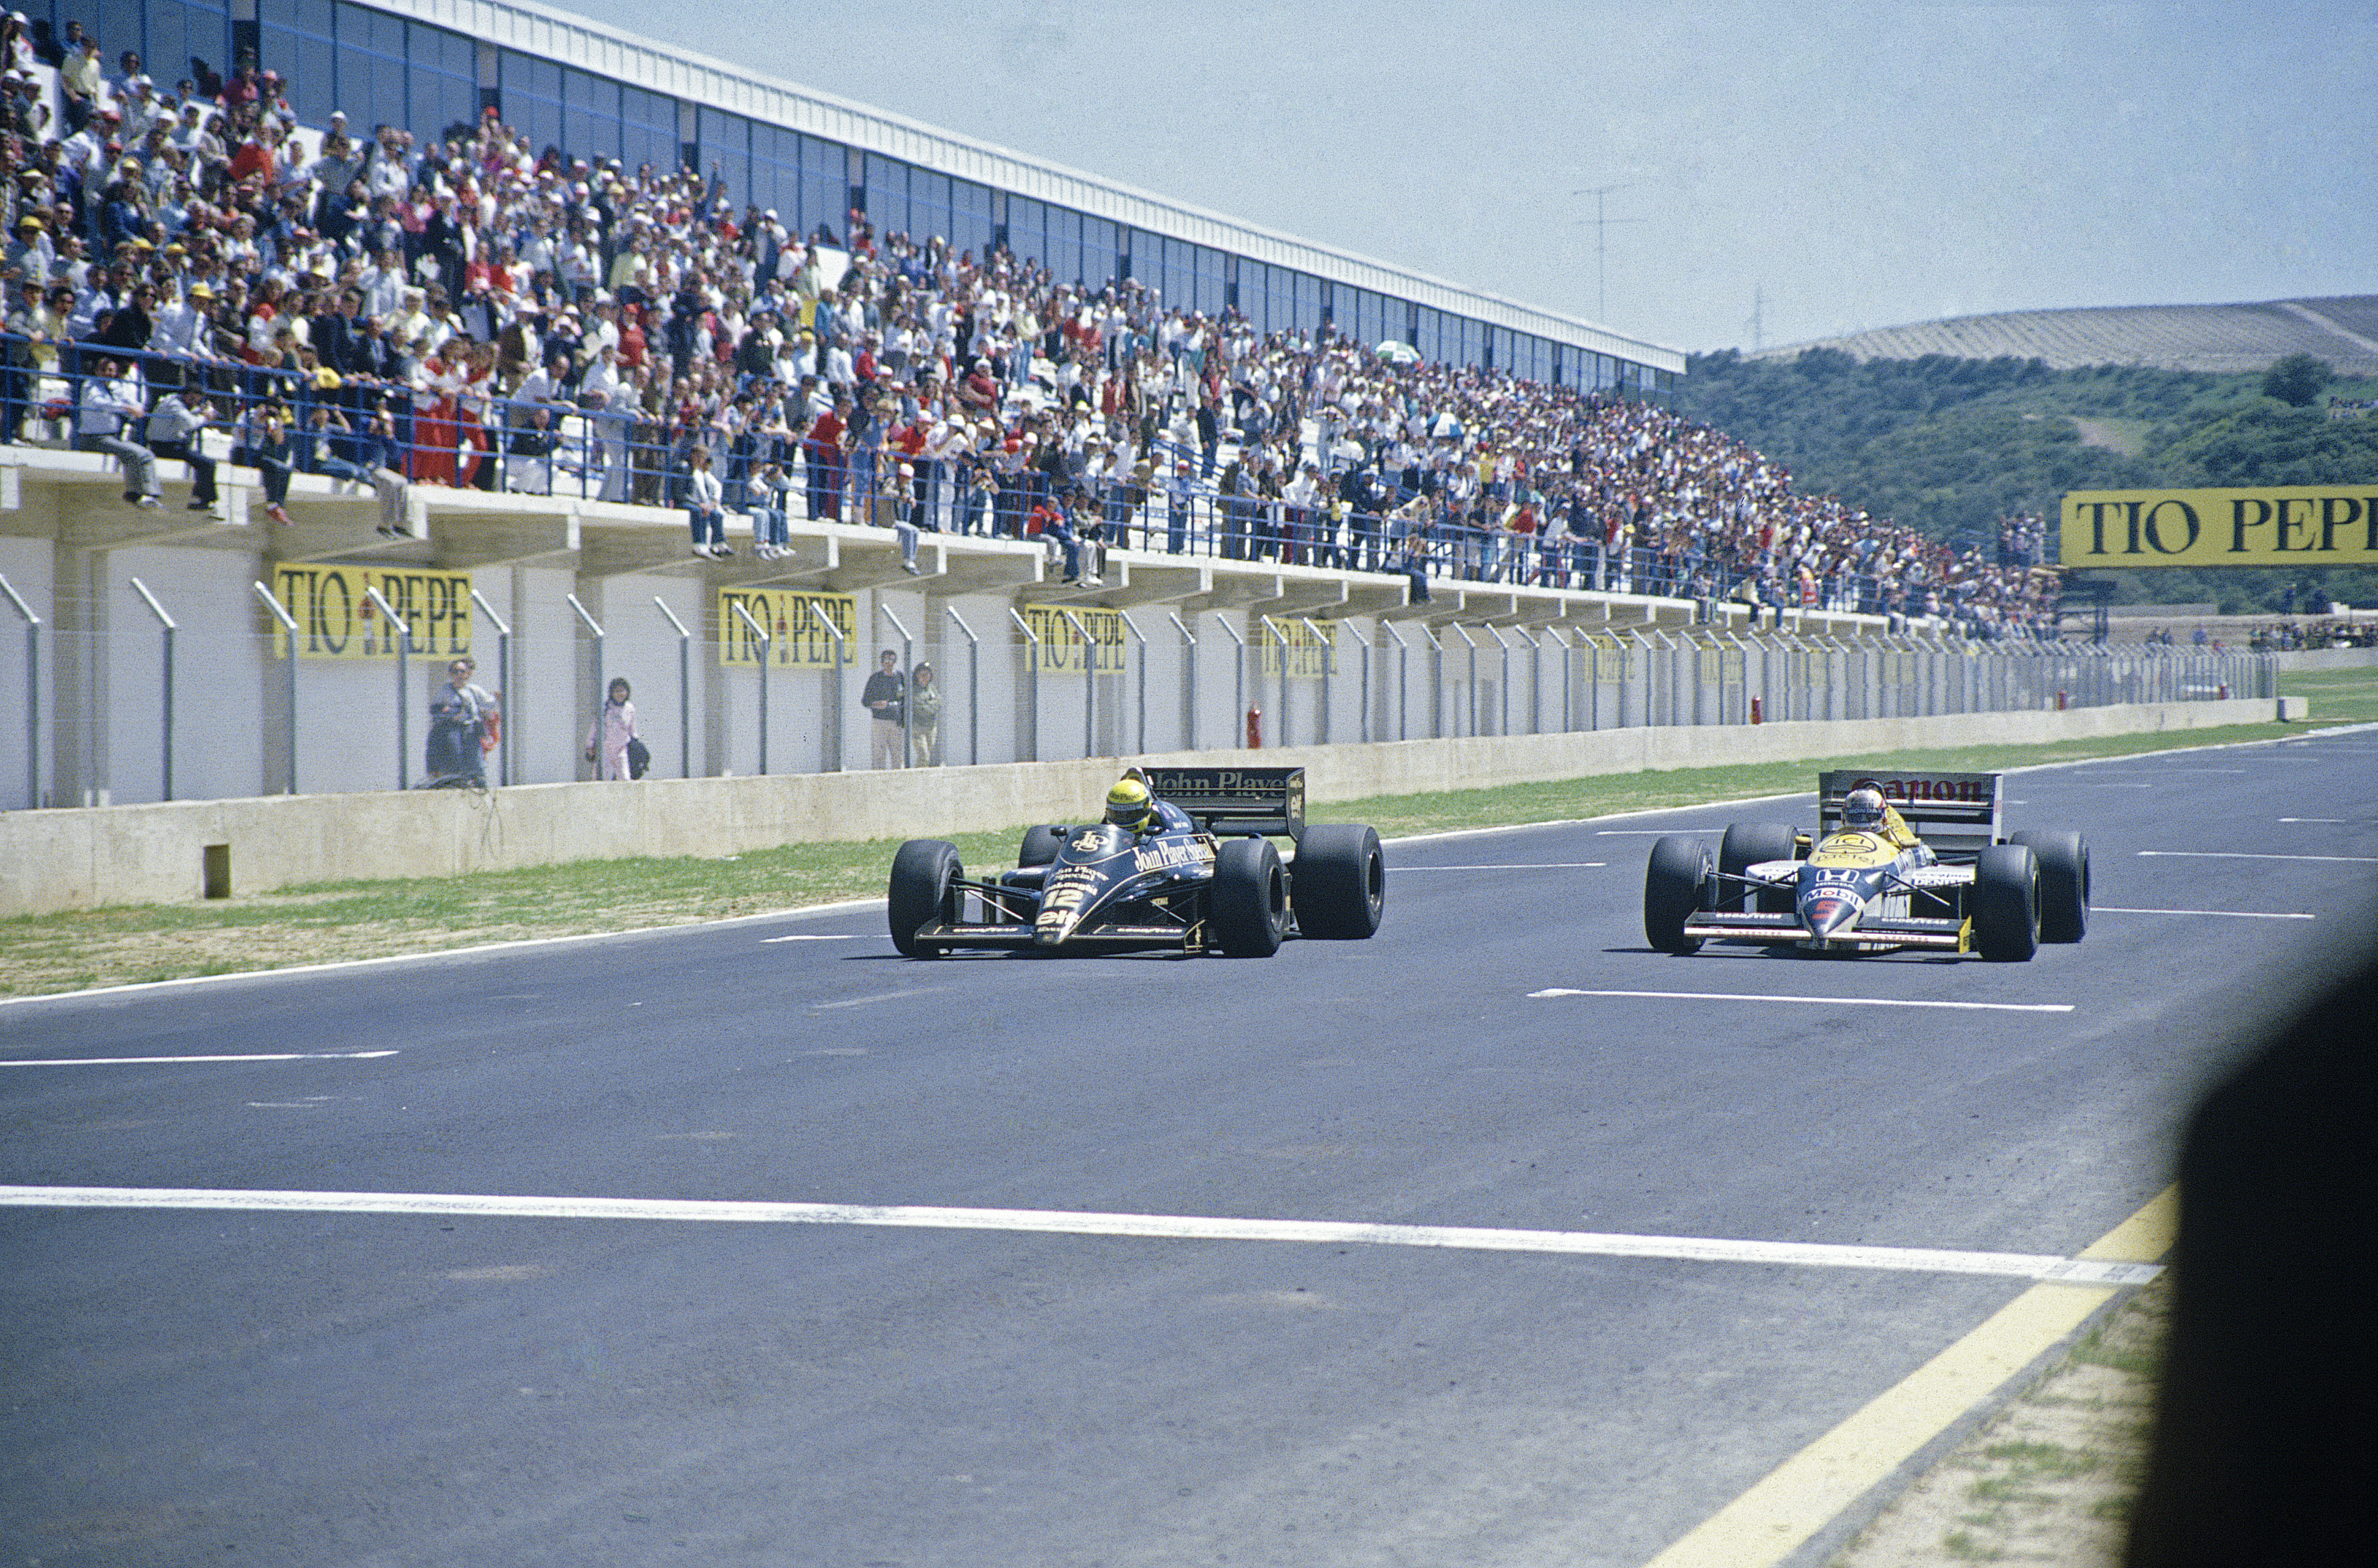 Senna i Lotus slår Mansell i Williams med 0,014 sekunder på Jerez i 1986. En av de mest utrolige innspurter i Formel 1 sin historie. Foto: Williams